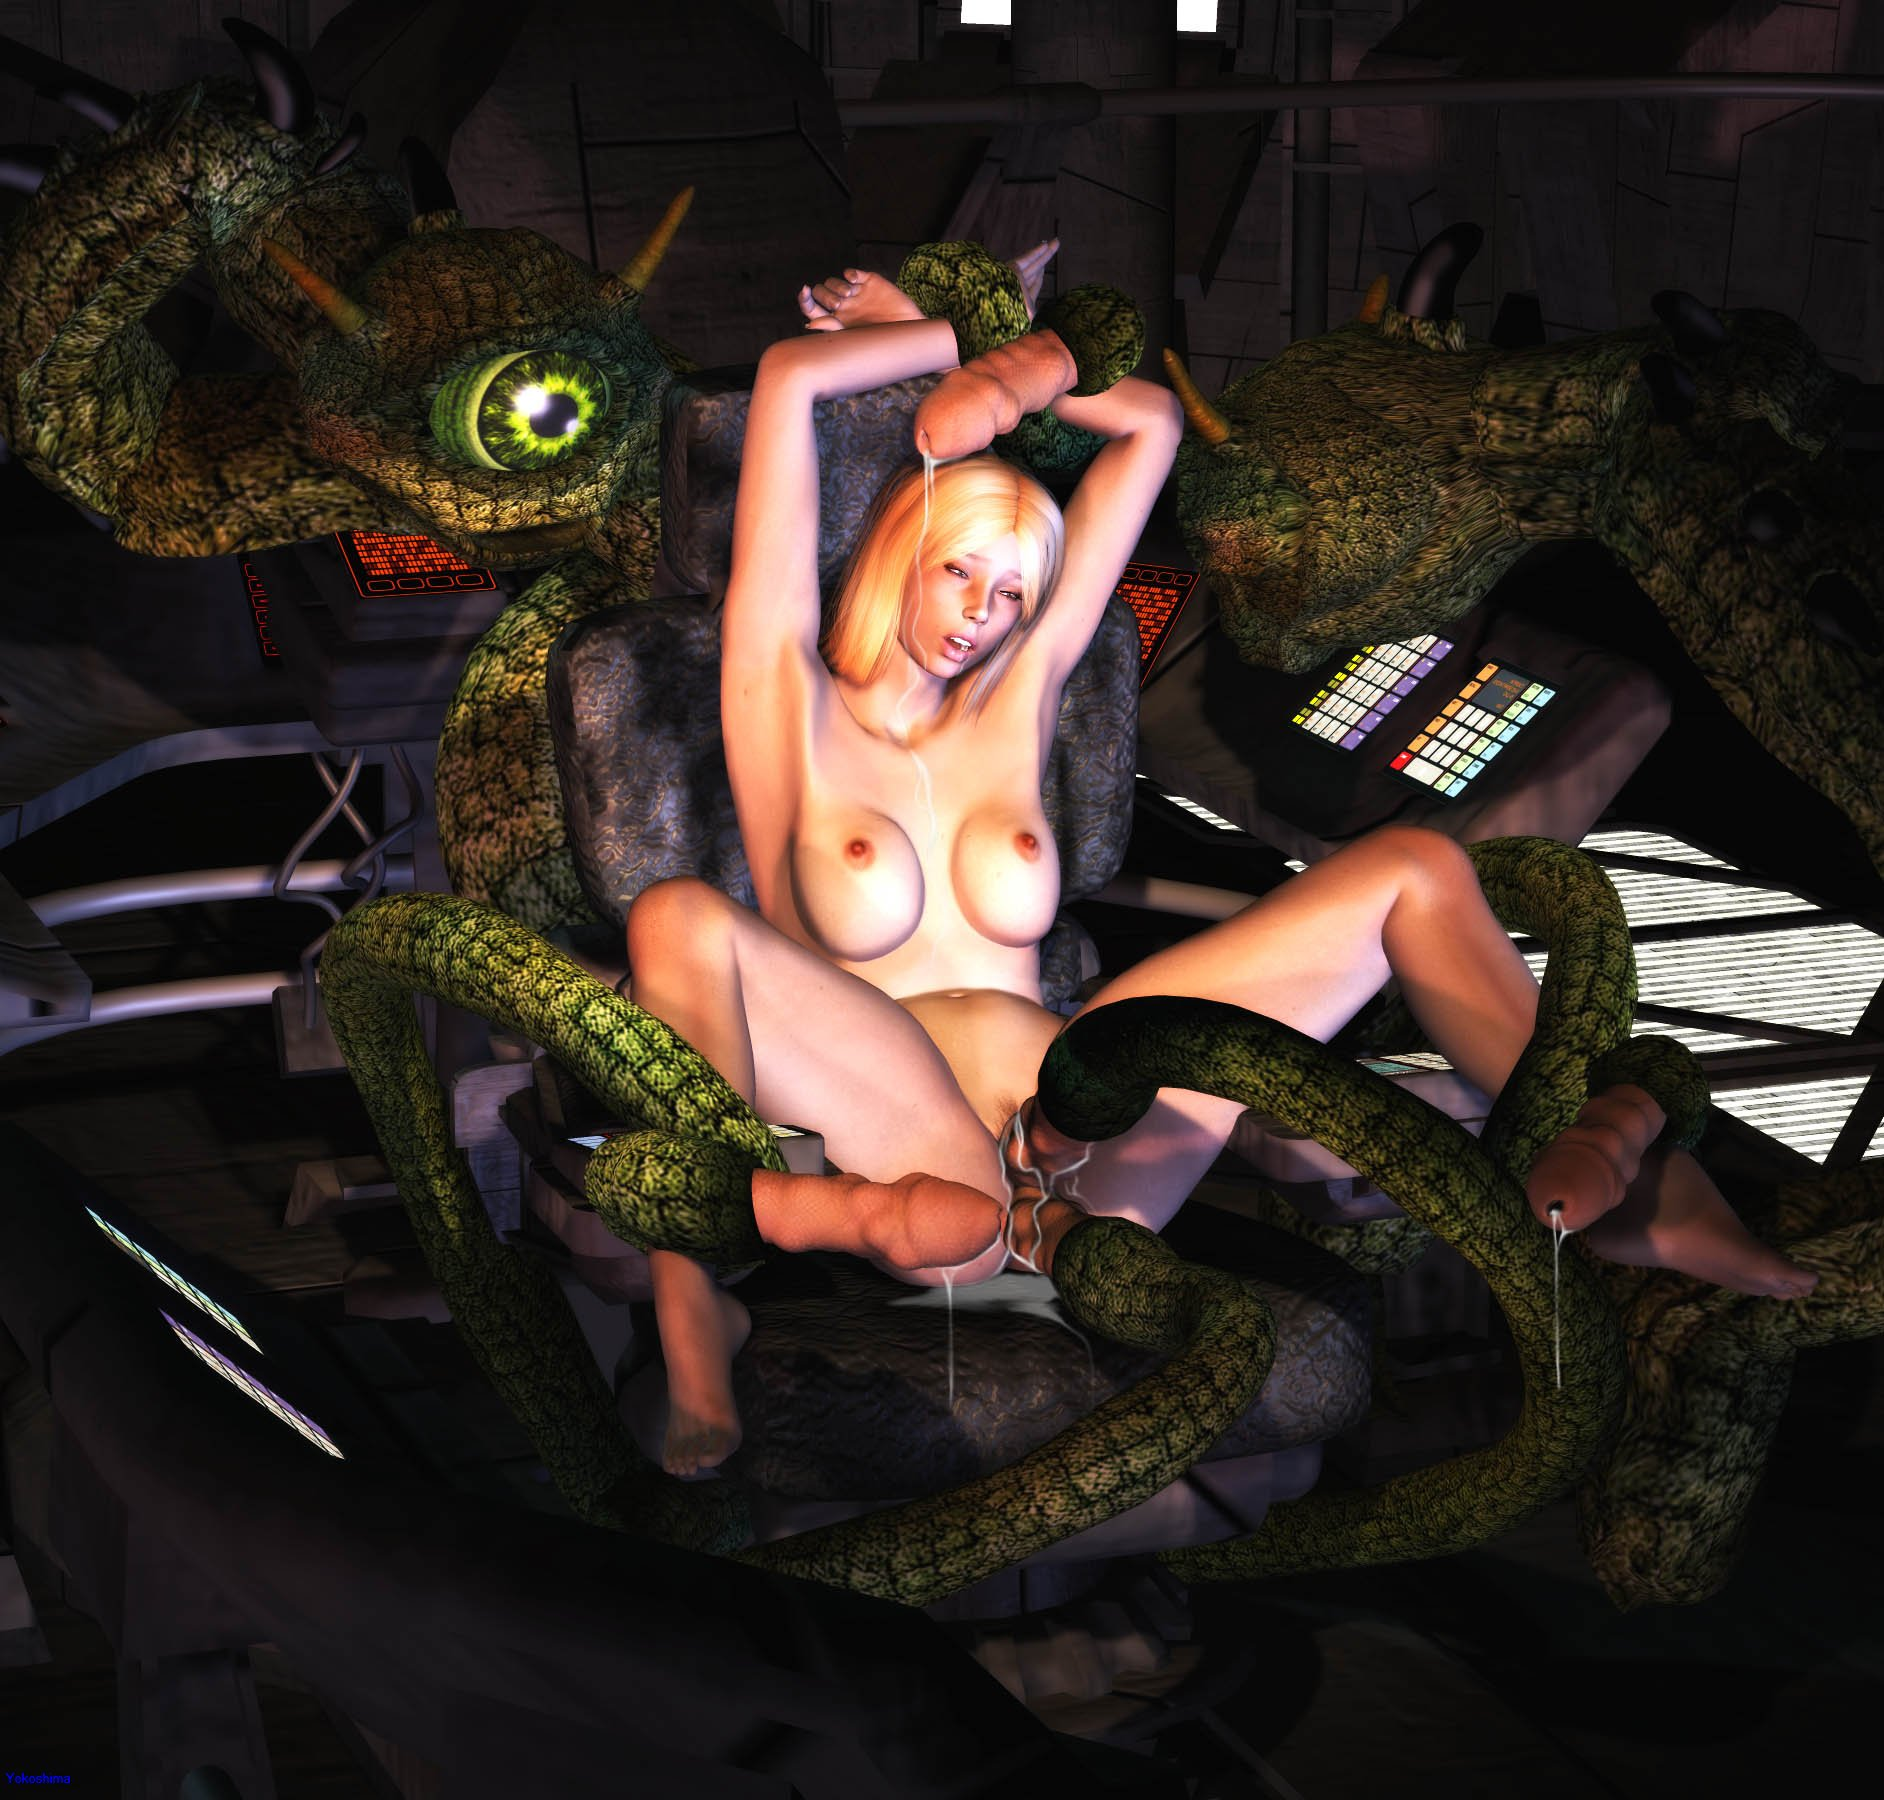 Alien sexe girls image galeary pornos scene